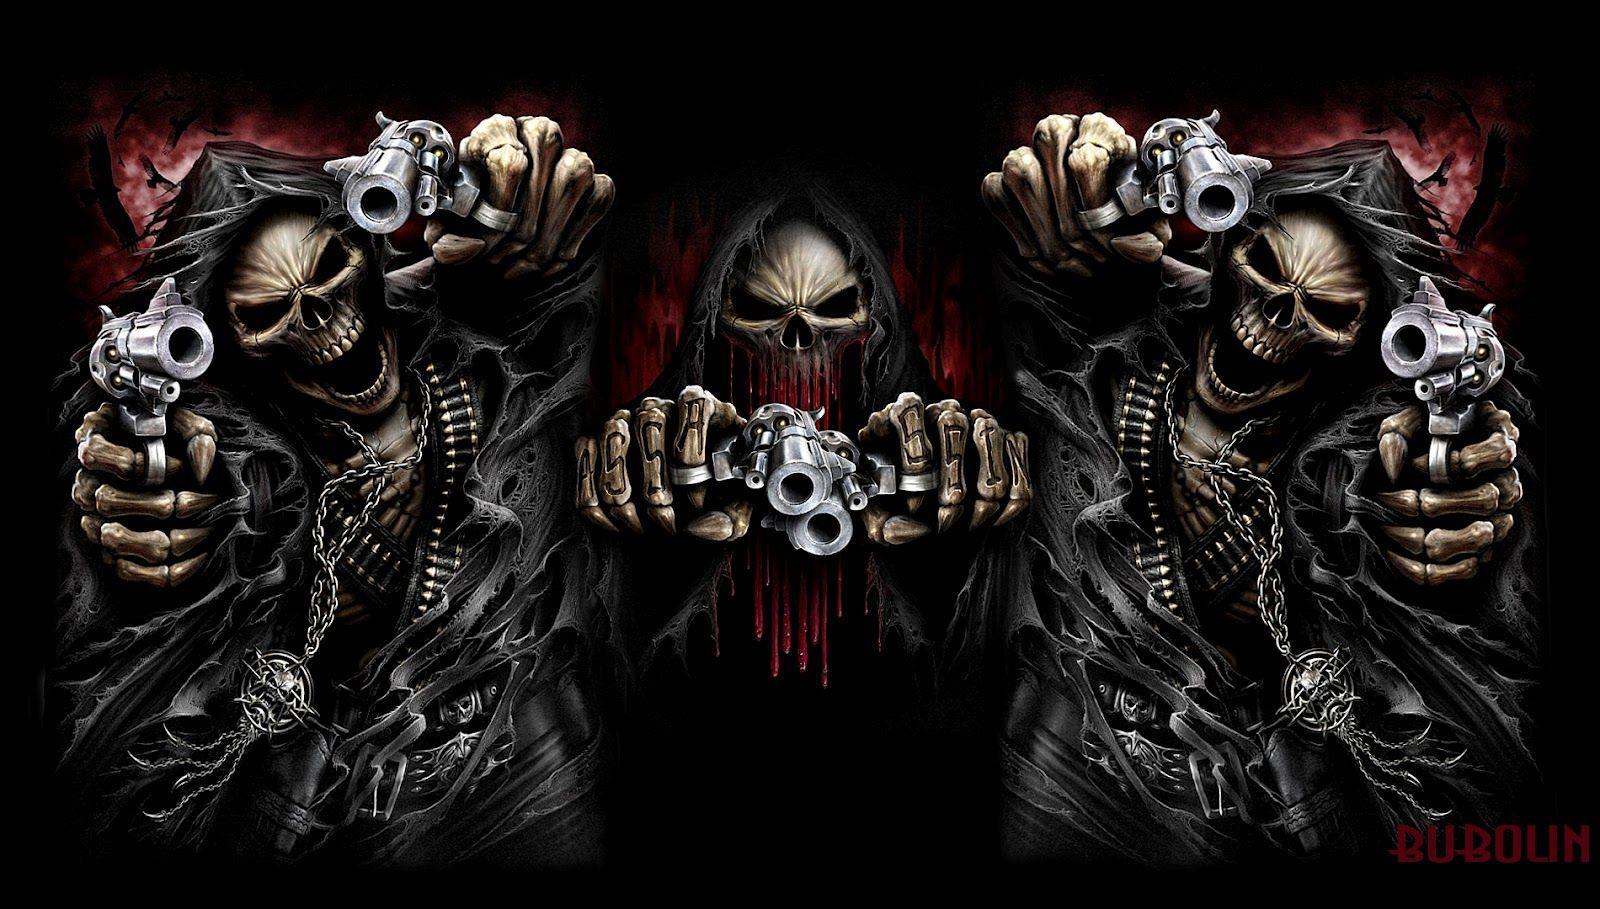 Death skull wallpapers top free death skull backgrounds - Skeleton wallpaper ...